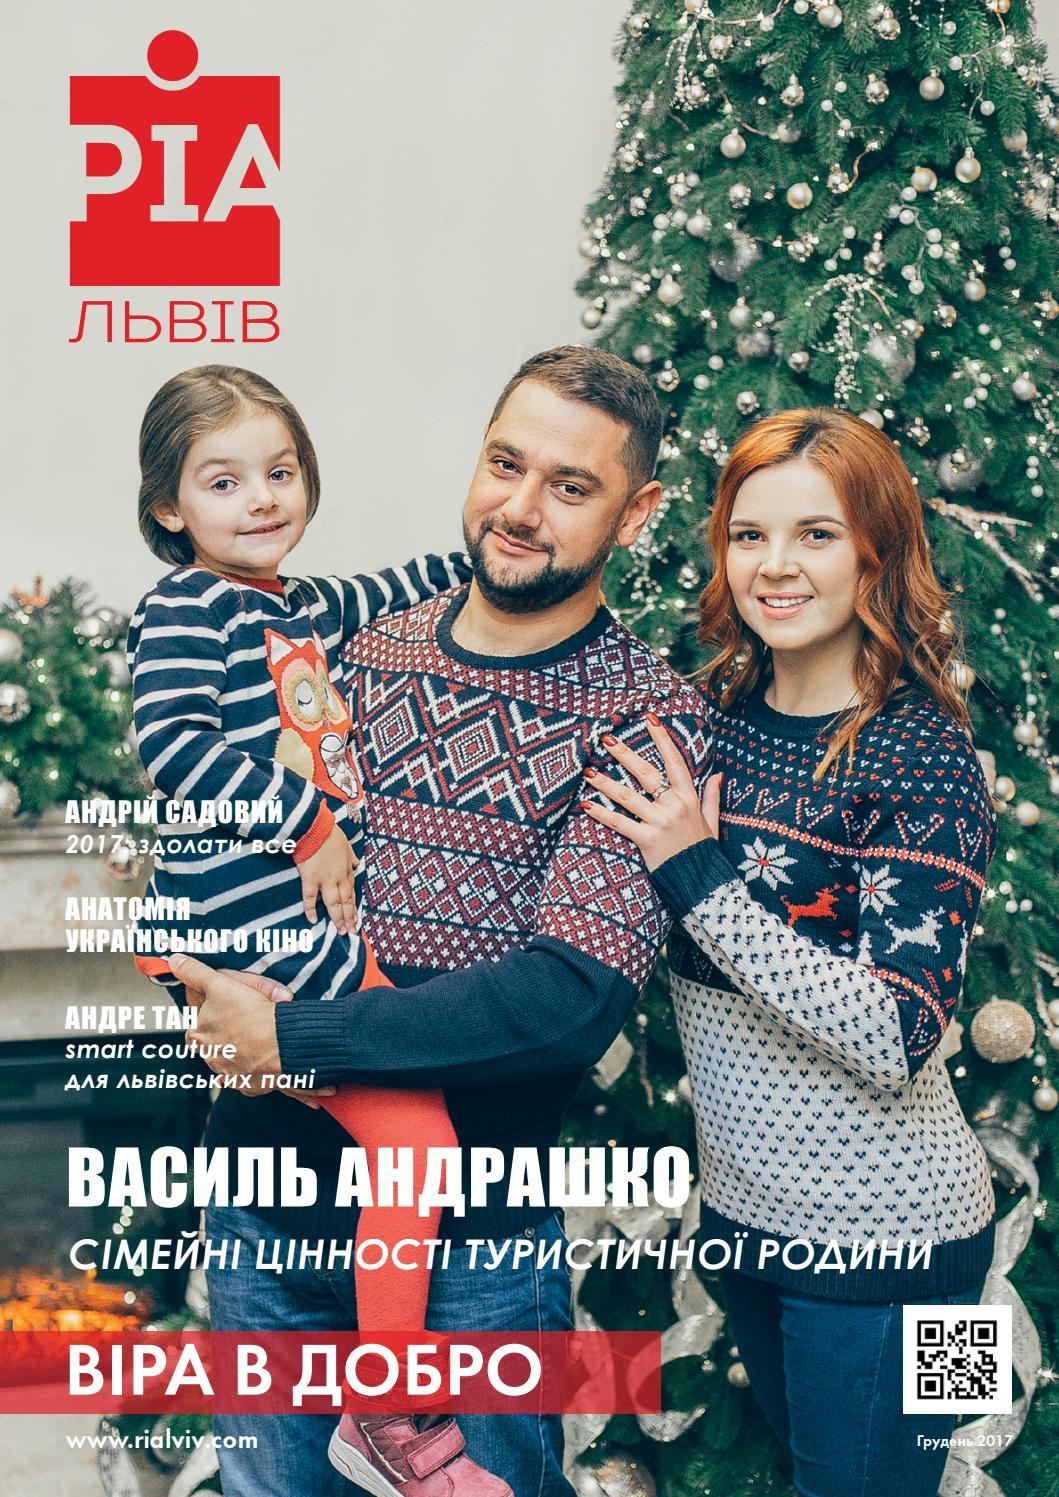 af7c25e67f6330 РІА Львів №10 (грудень 2017) by РІА Львів - issuu